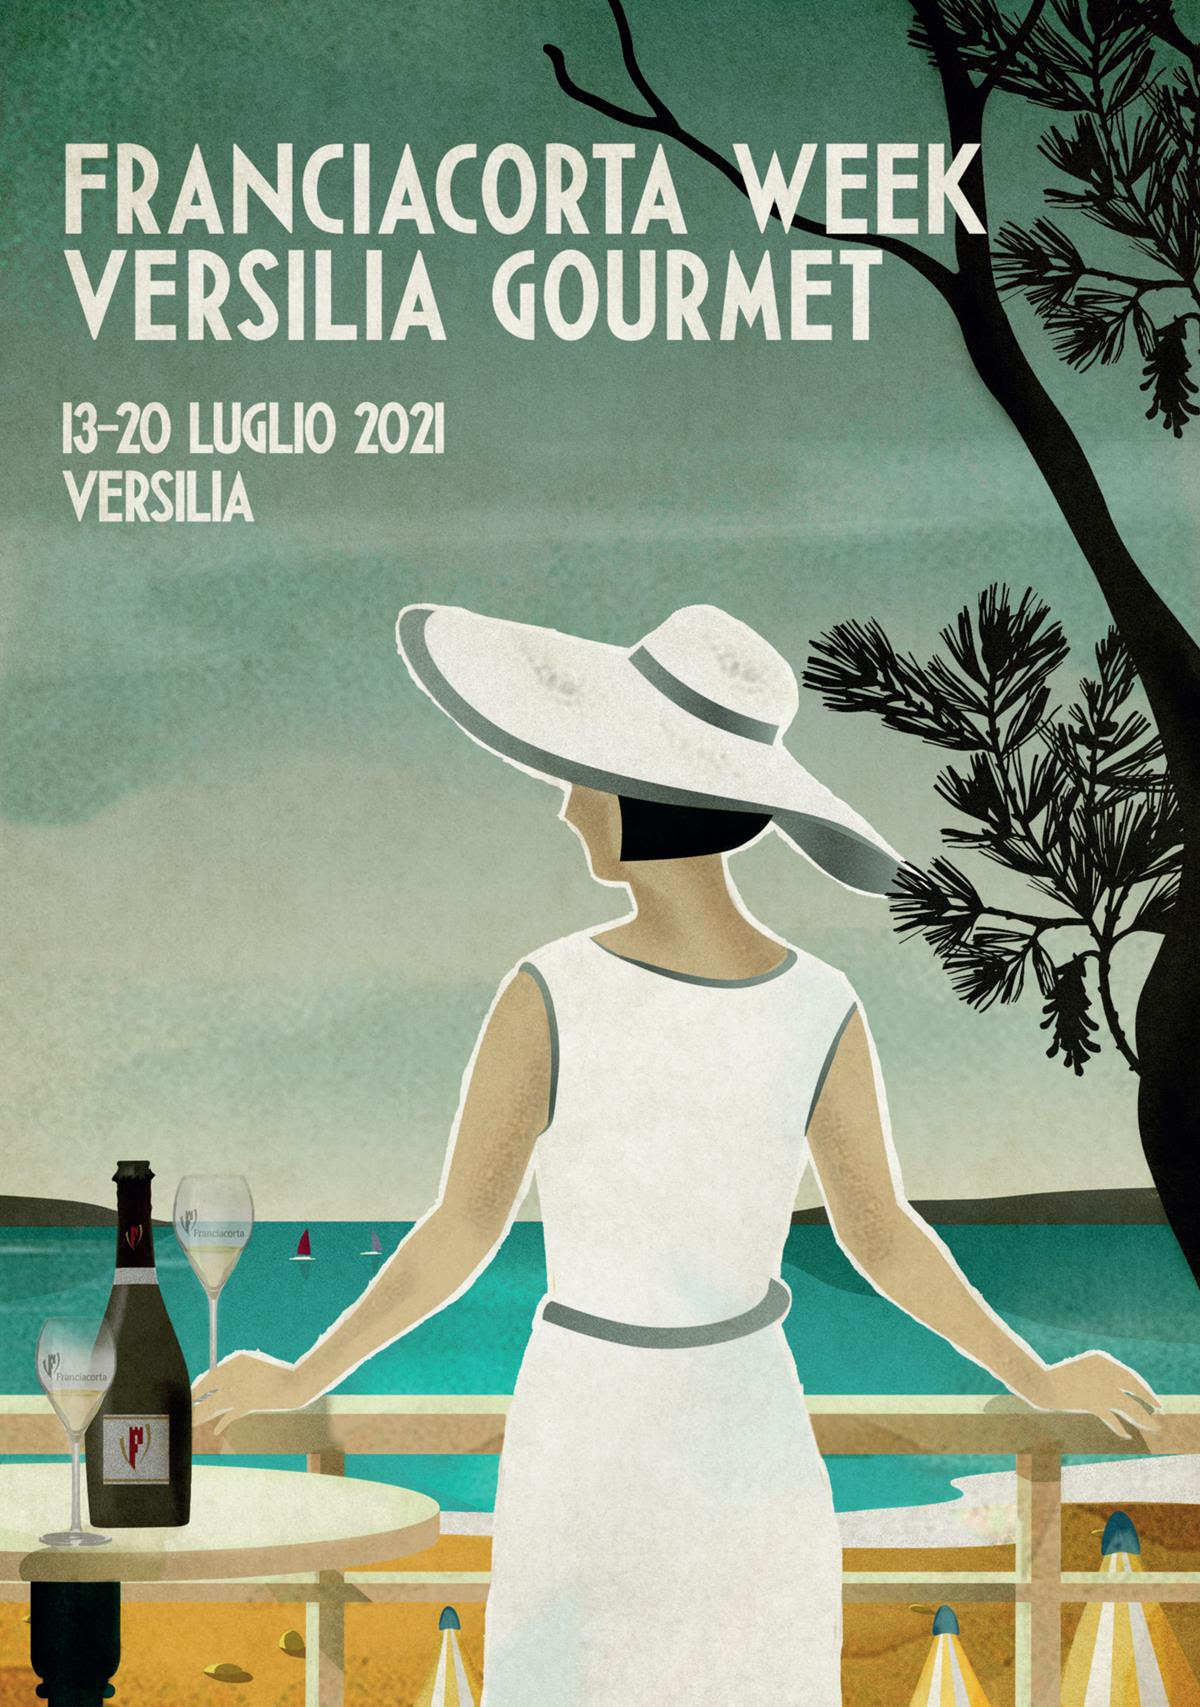 Franciacorta Week in Versilia